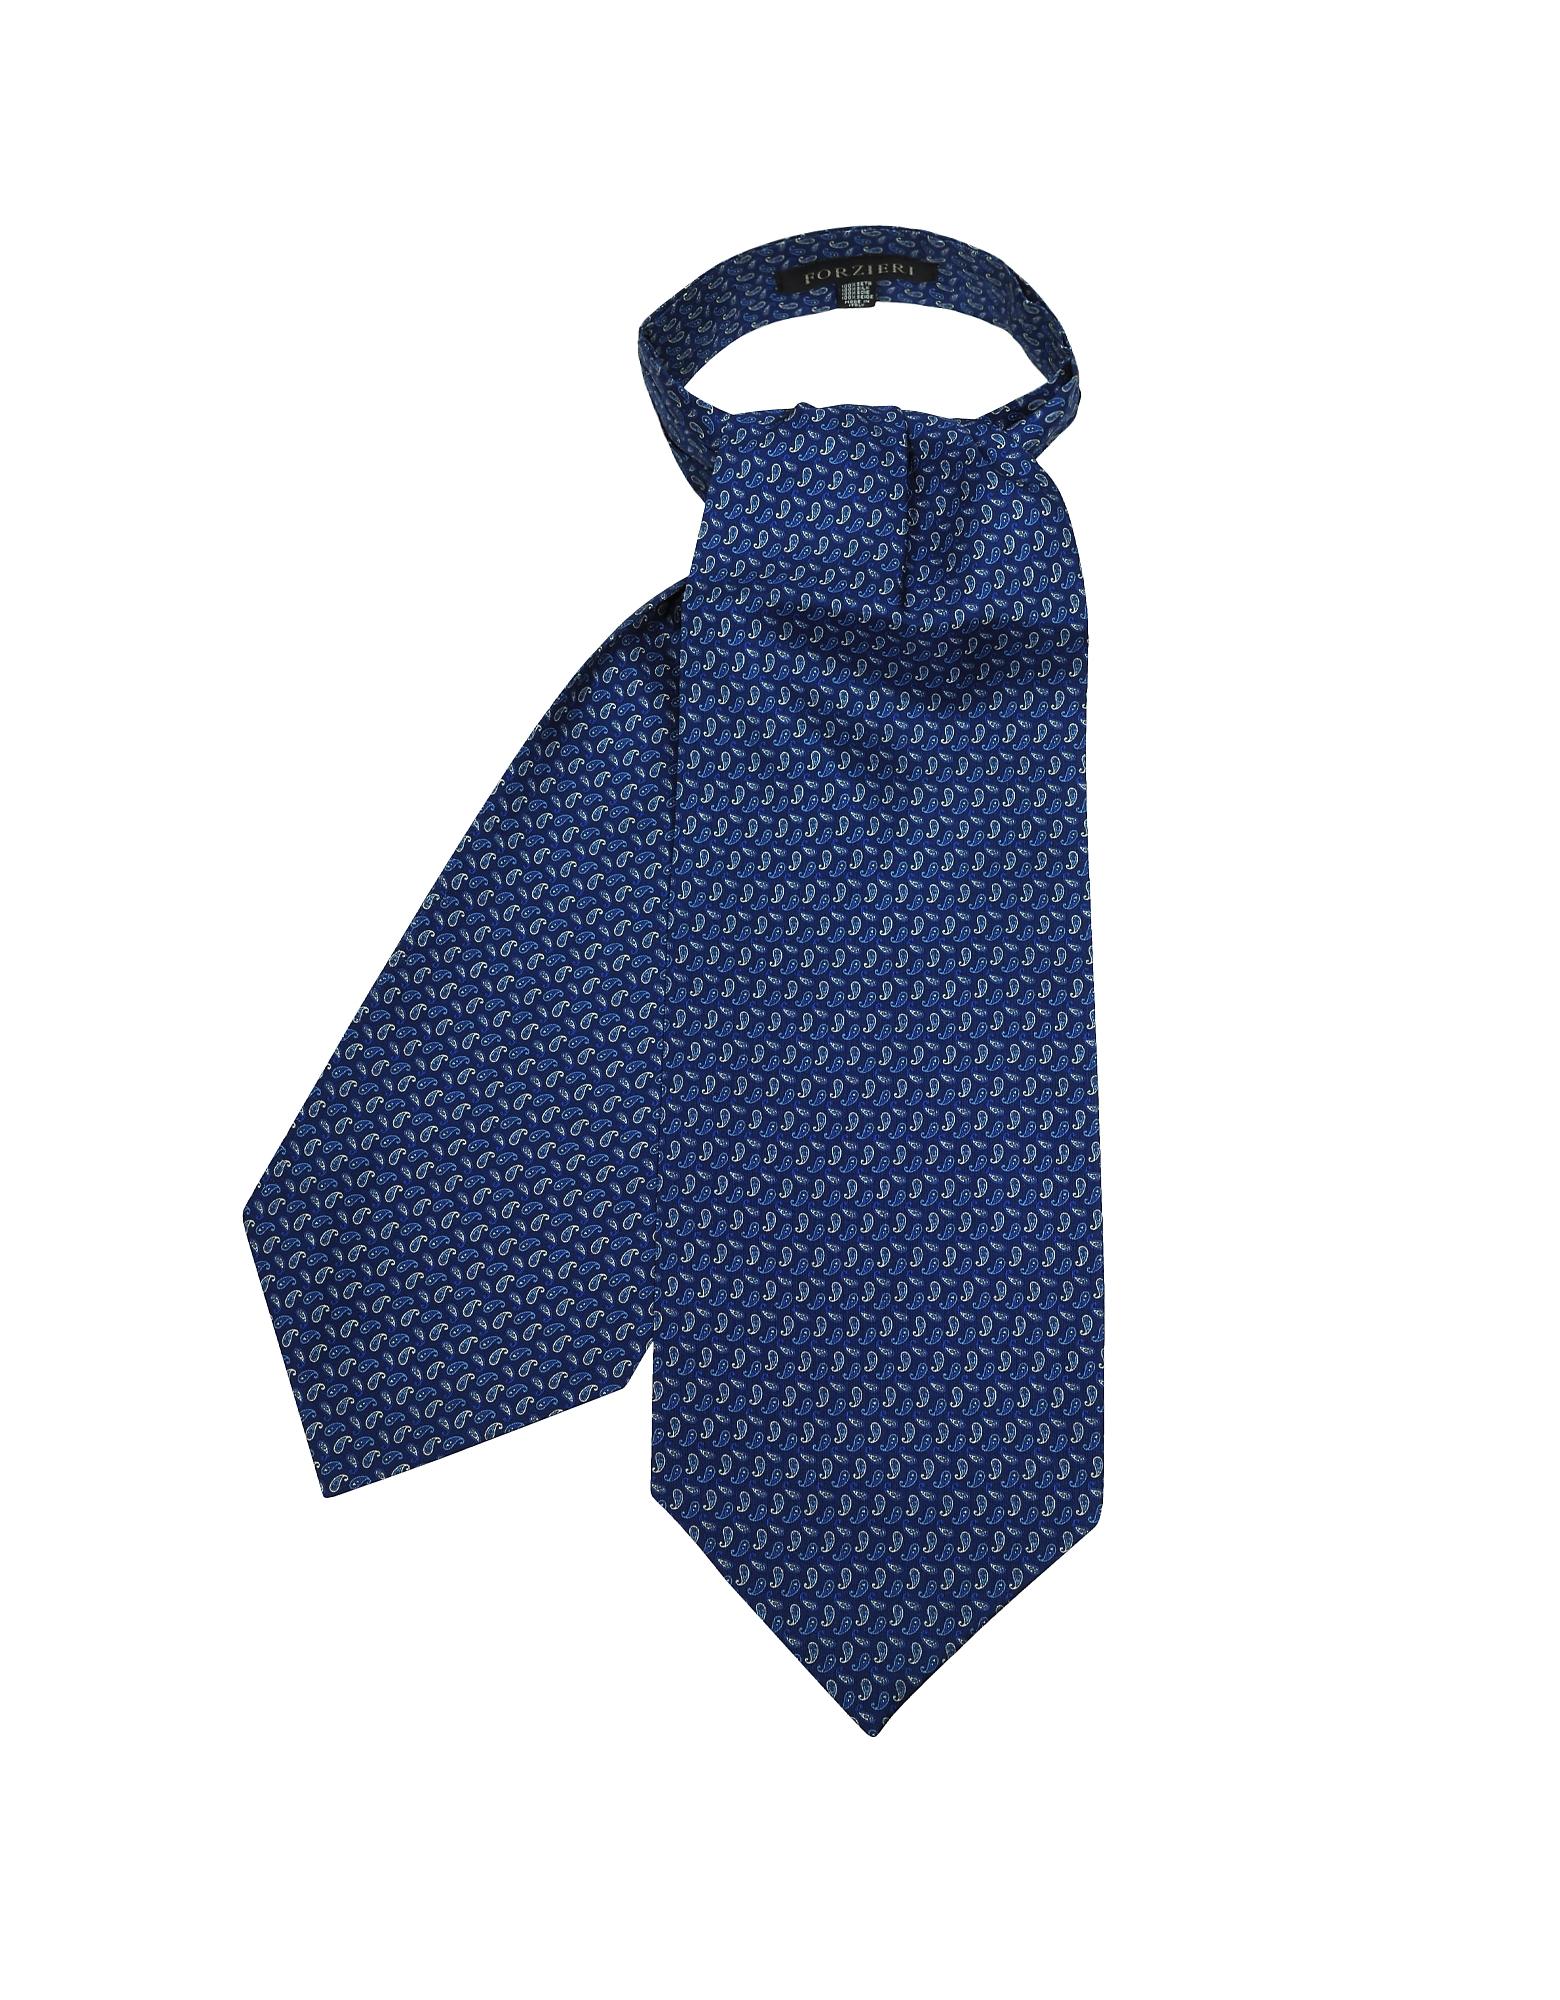 Forzieri Designer Ascot ties, Bright Blue Paisley Printed Twill Silk Ascot Tie